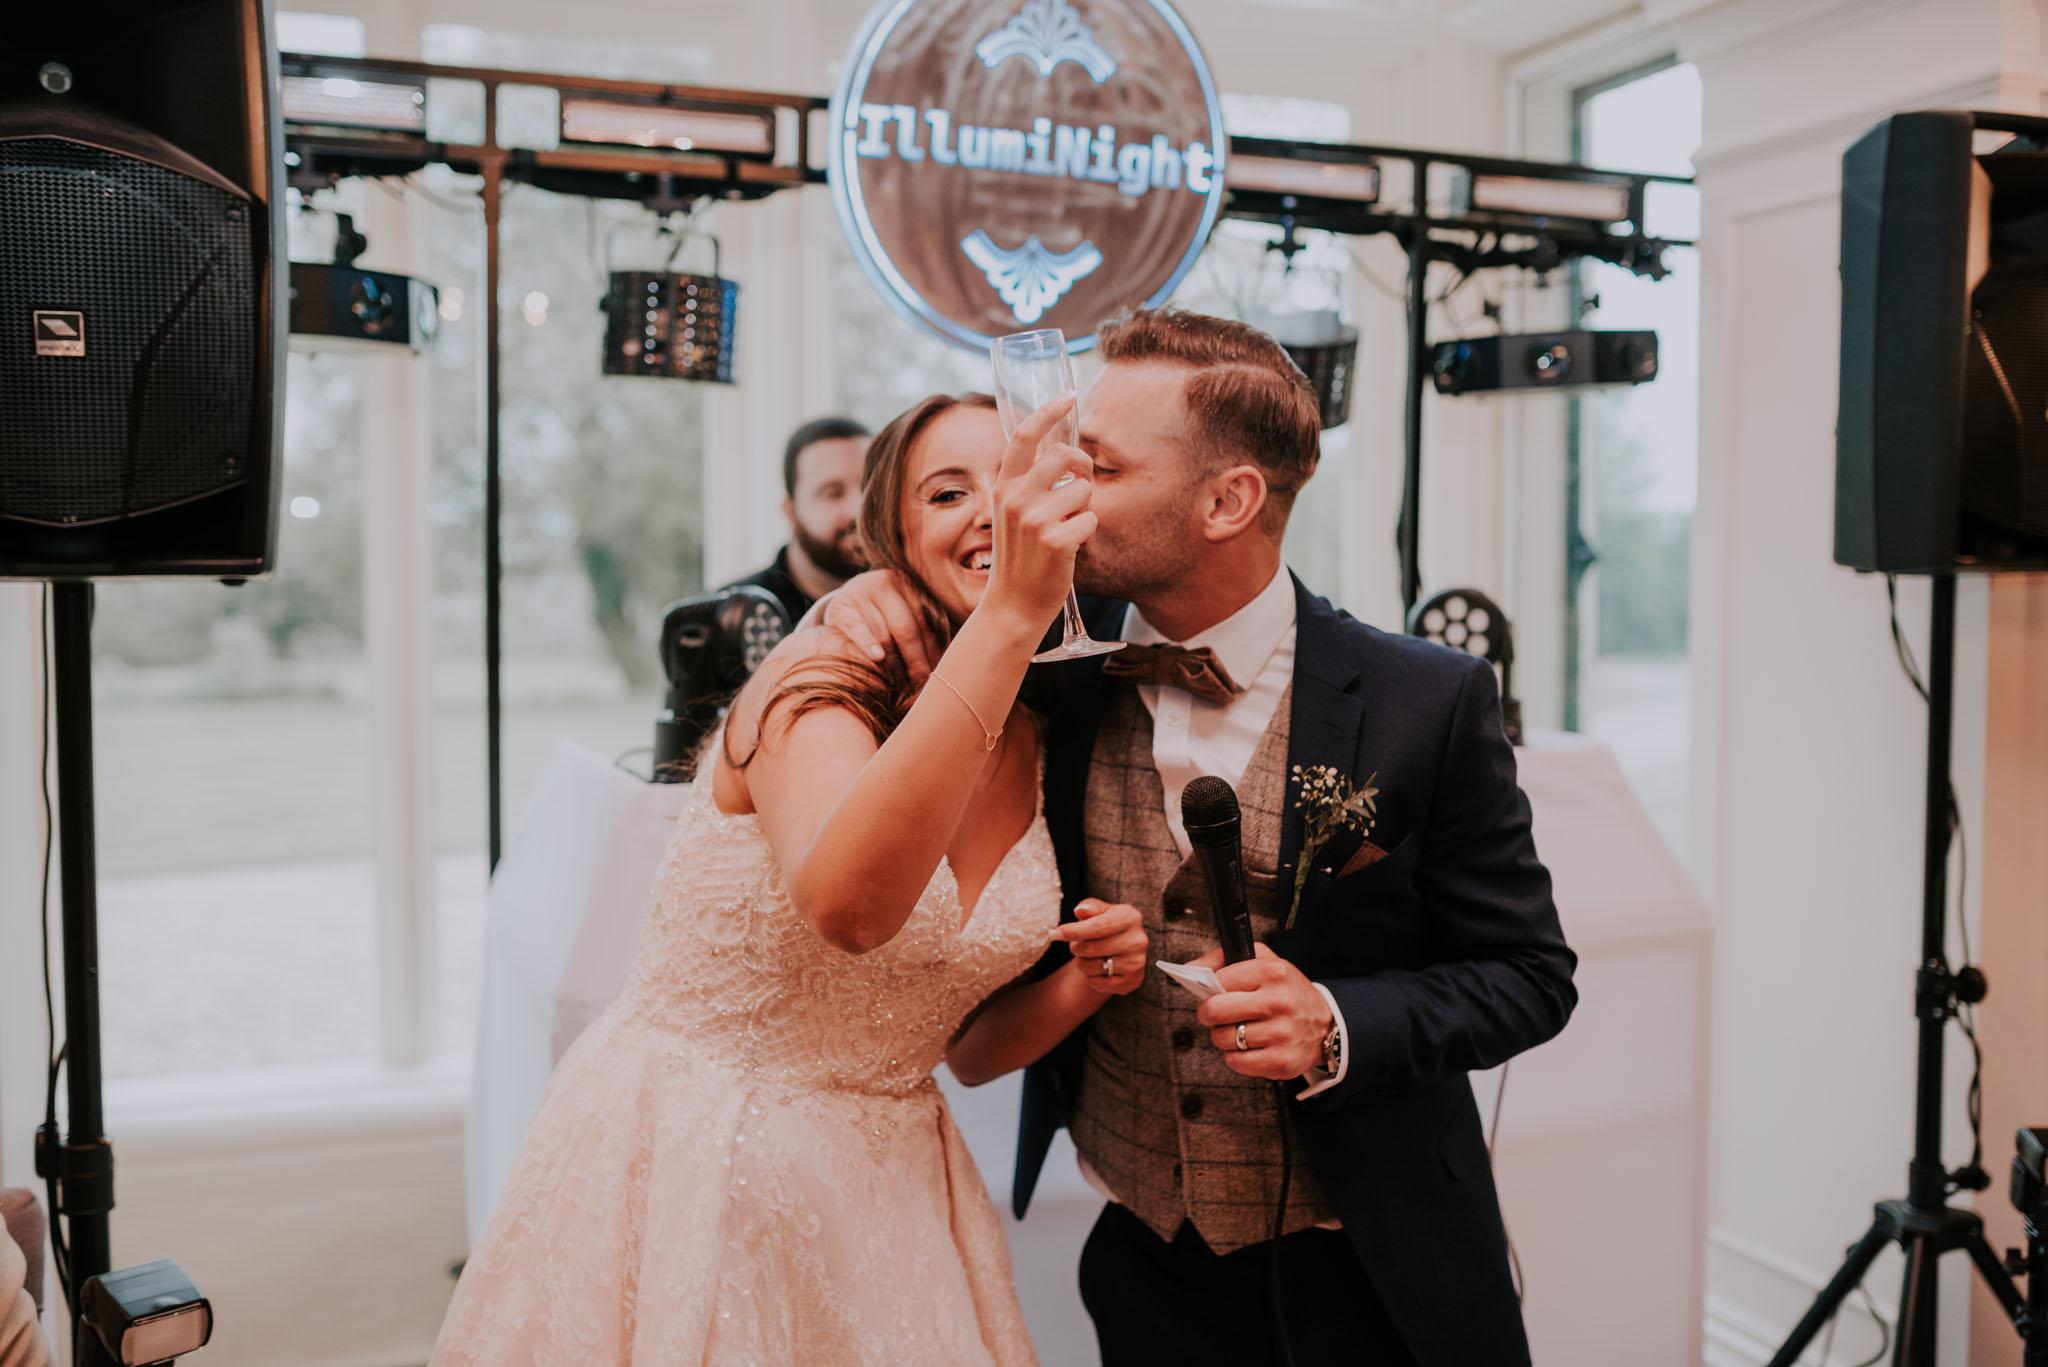 wedding-photographer-glewstone-court-hereford-scott-stockwell-photography446.jpg